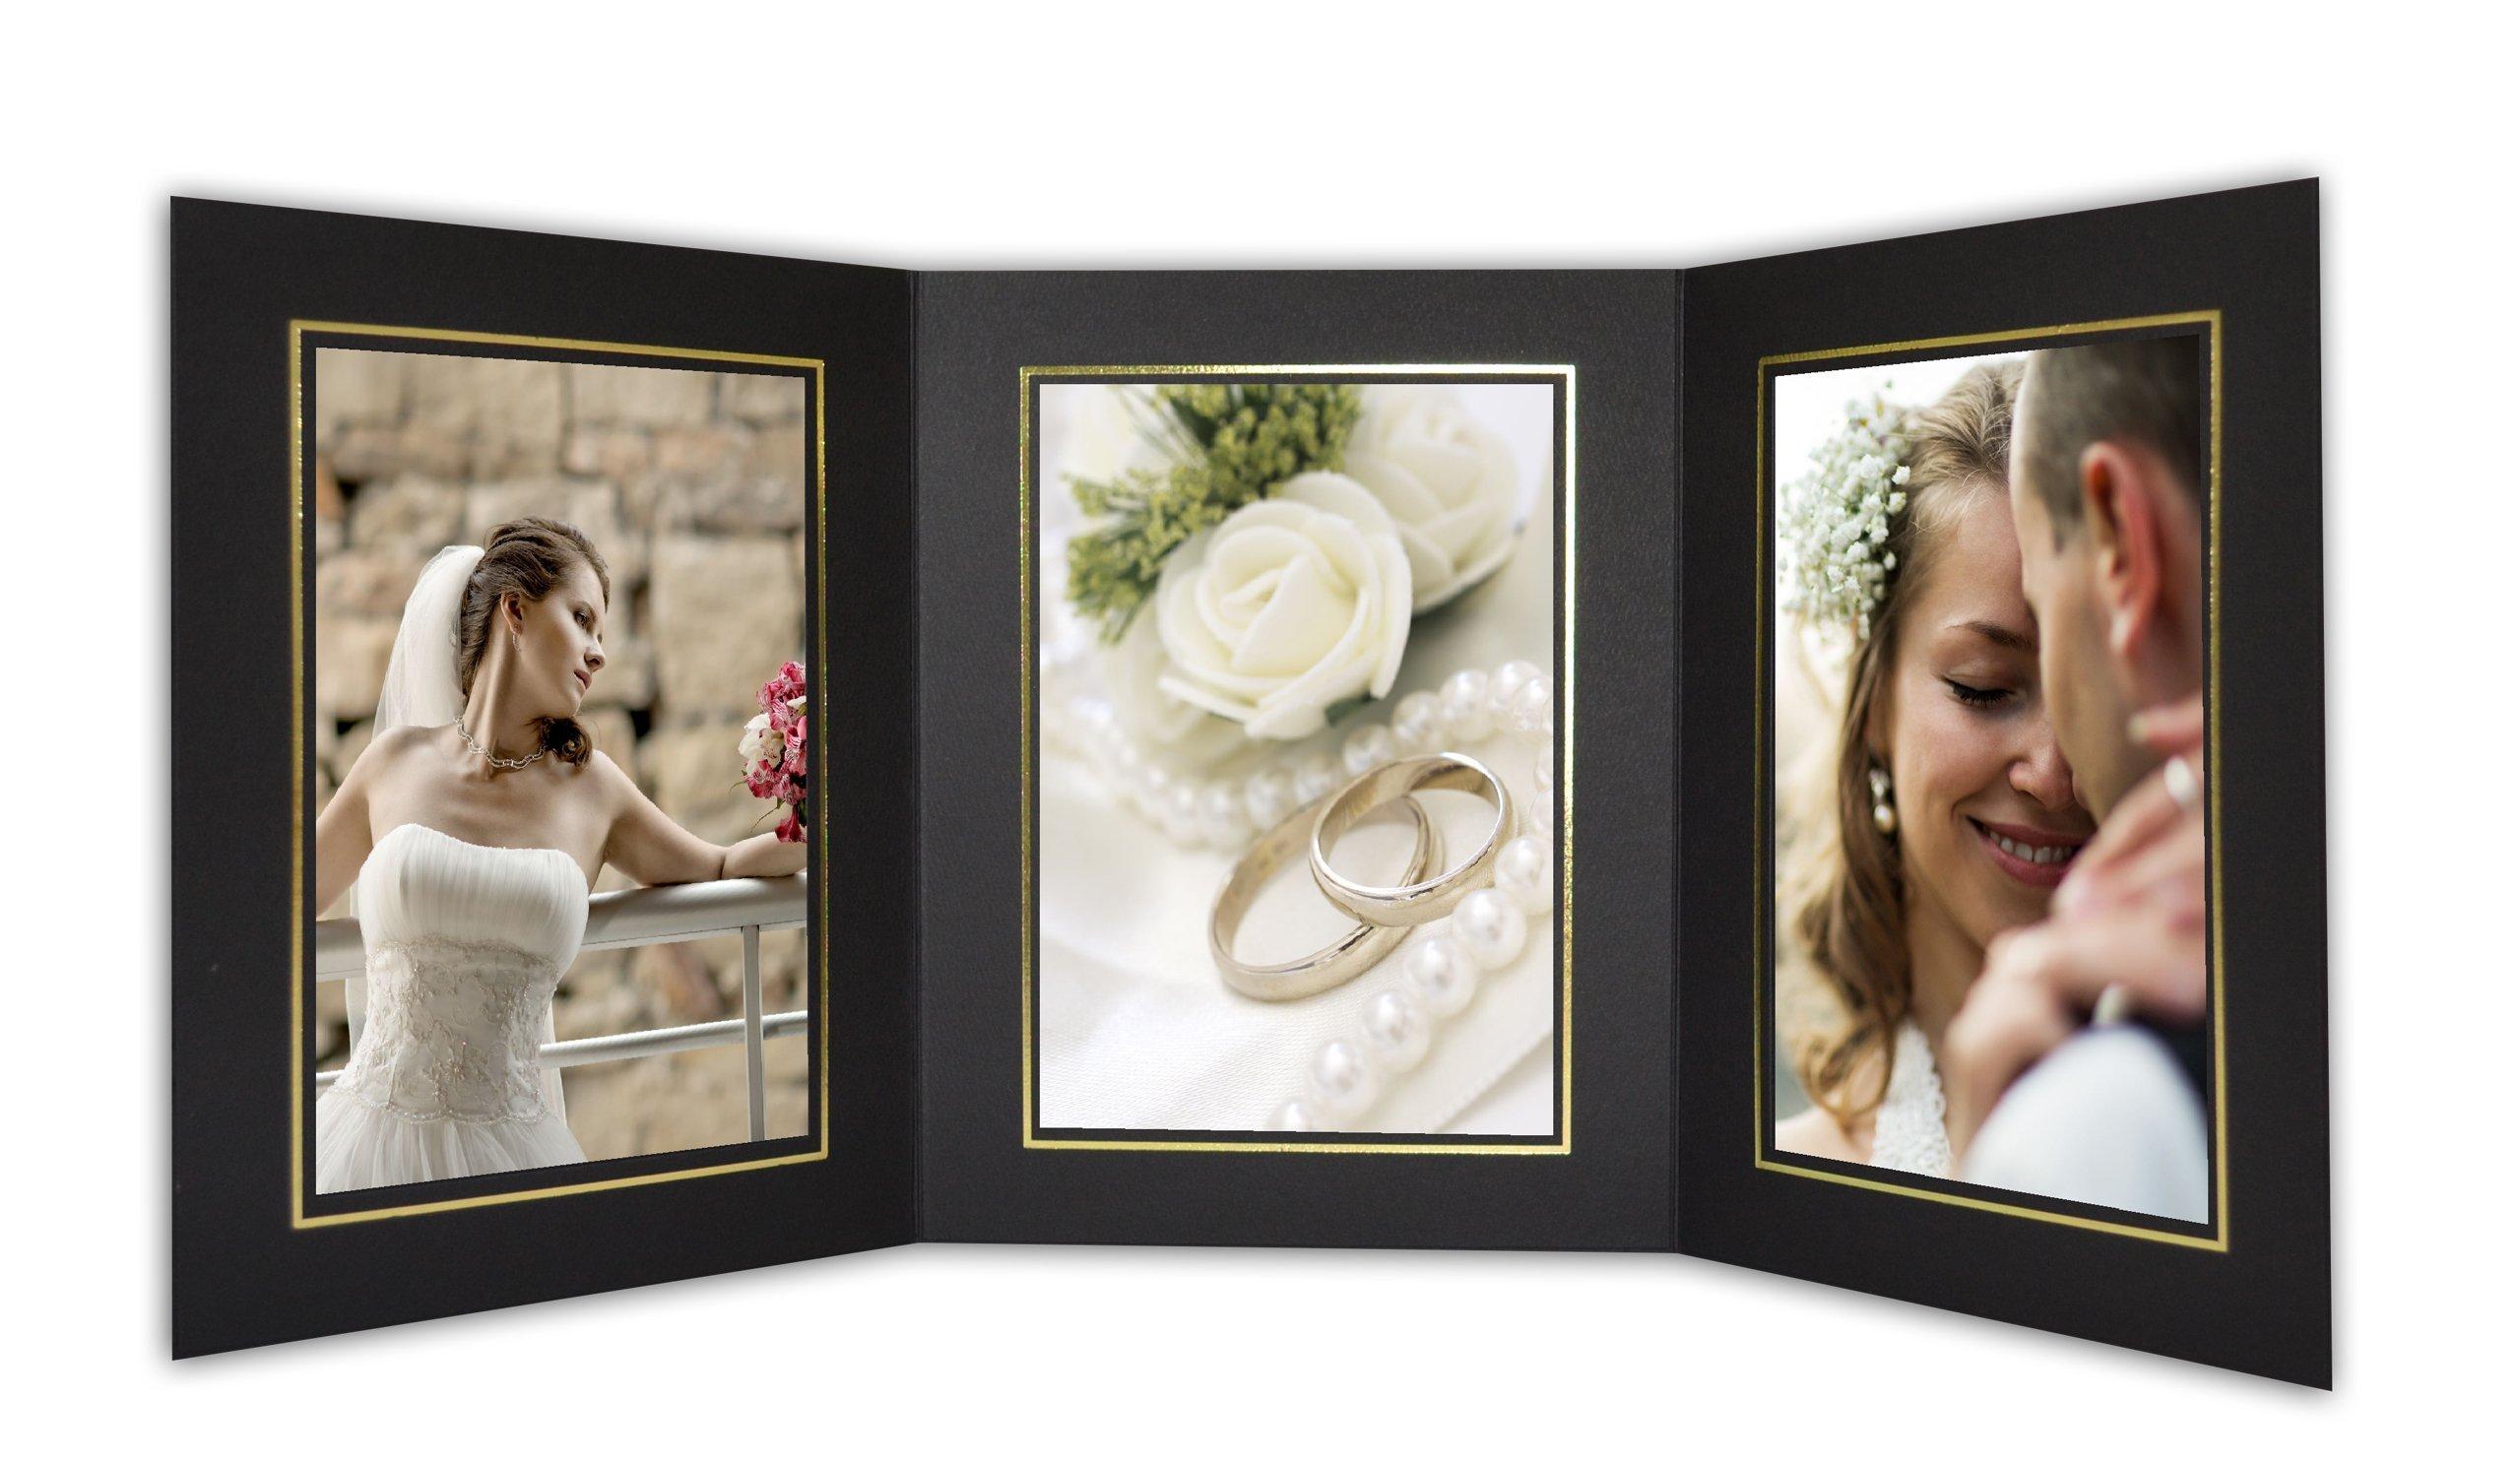 Golden State Art, Cardboard Photo Folder for 3 5x7 Photo (Pack of 50) GS005 Black Color